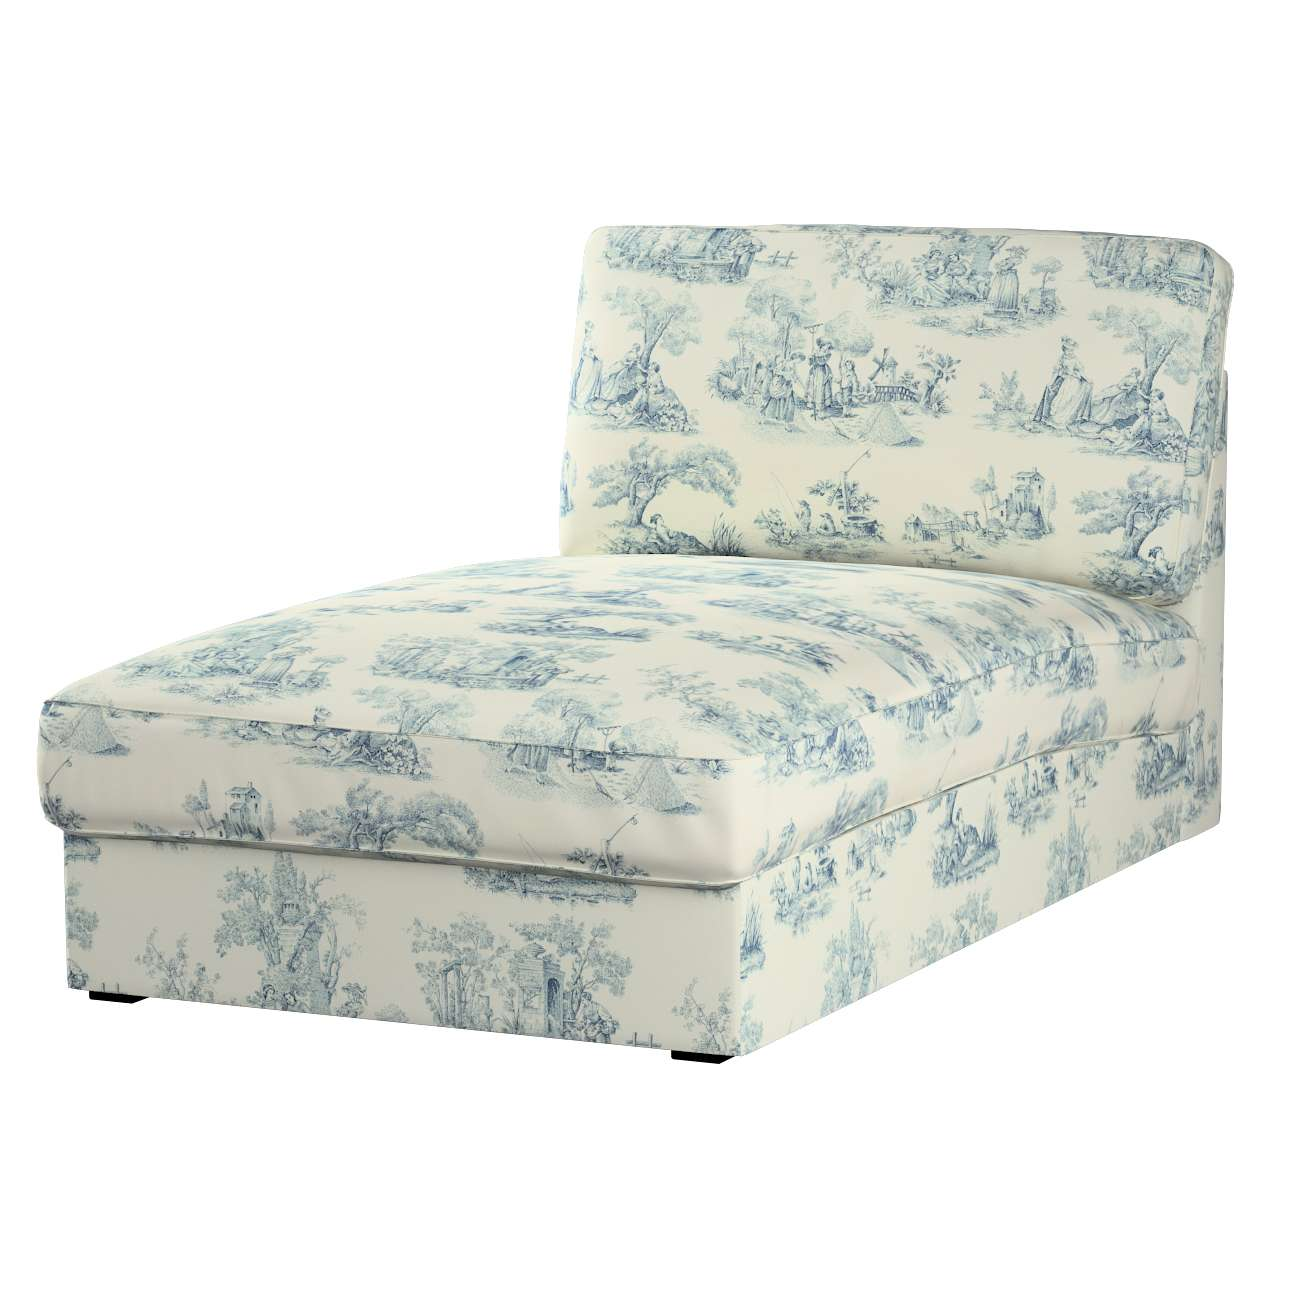 kivik recamiere sofabezug creme blau dekoria. Black Bedroom Furniture Sets. Home Design Ideas